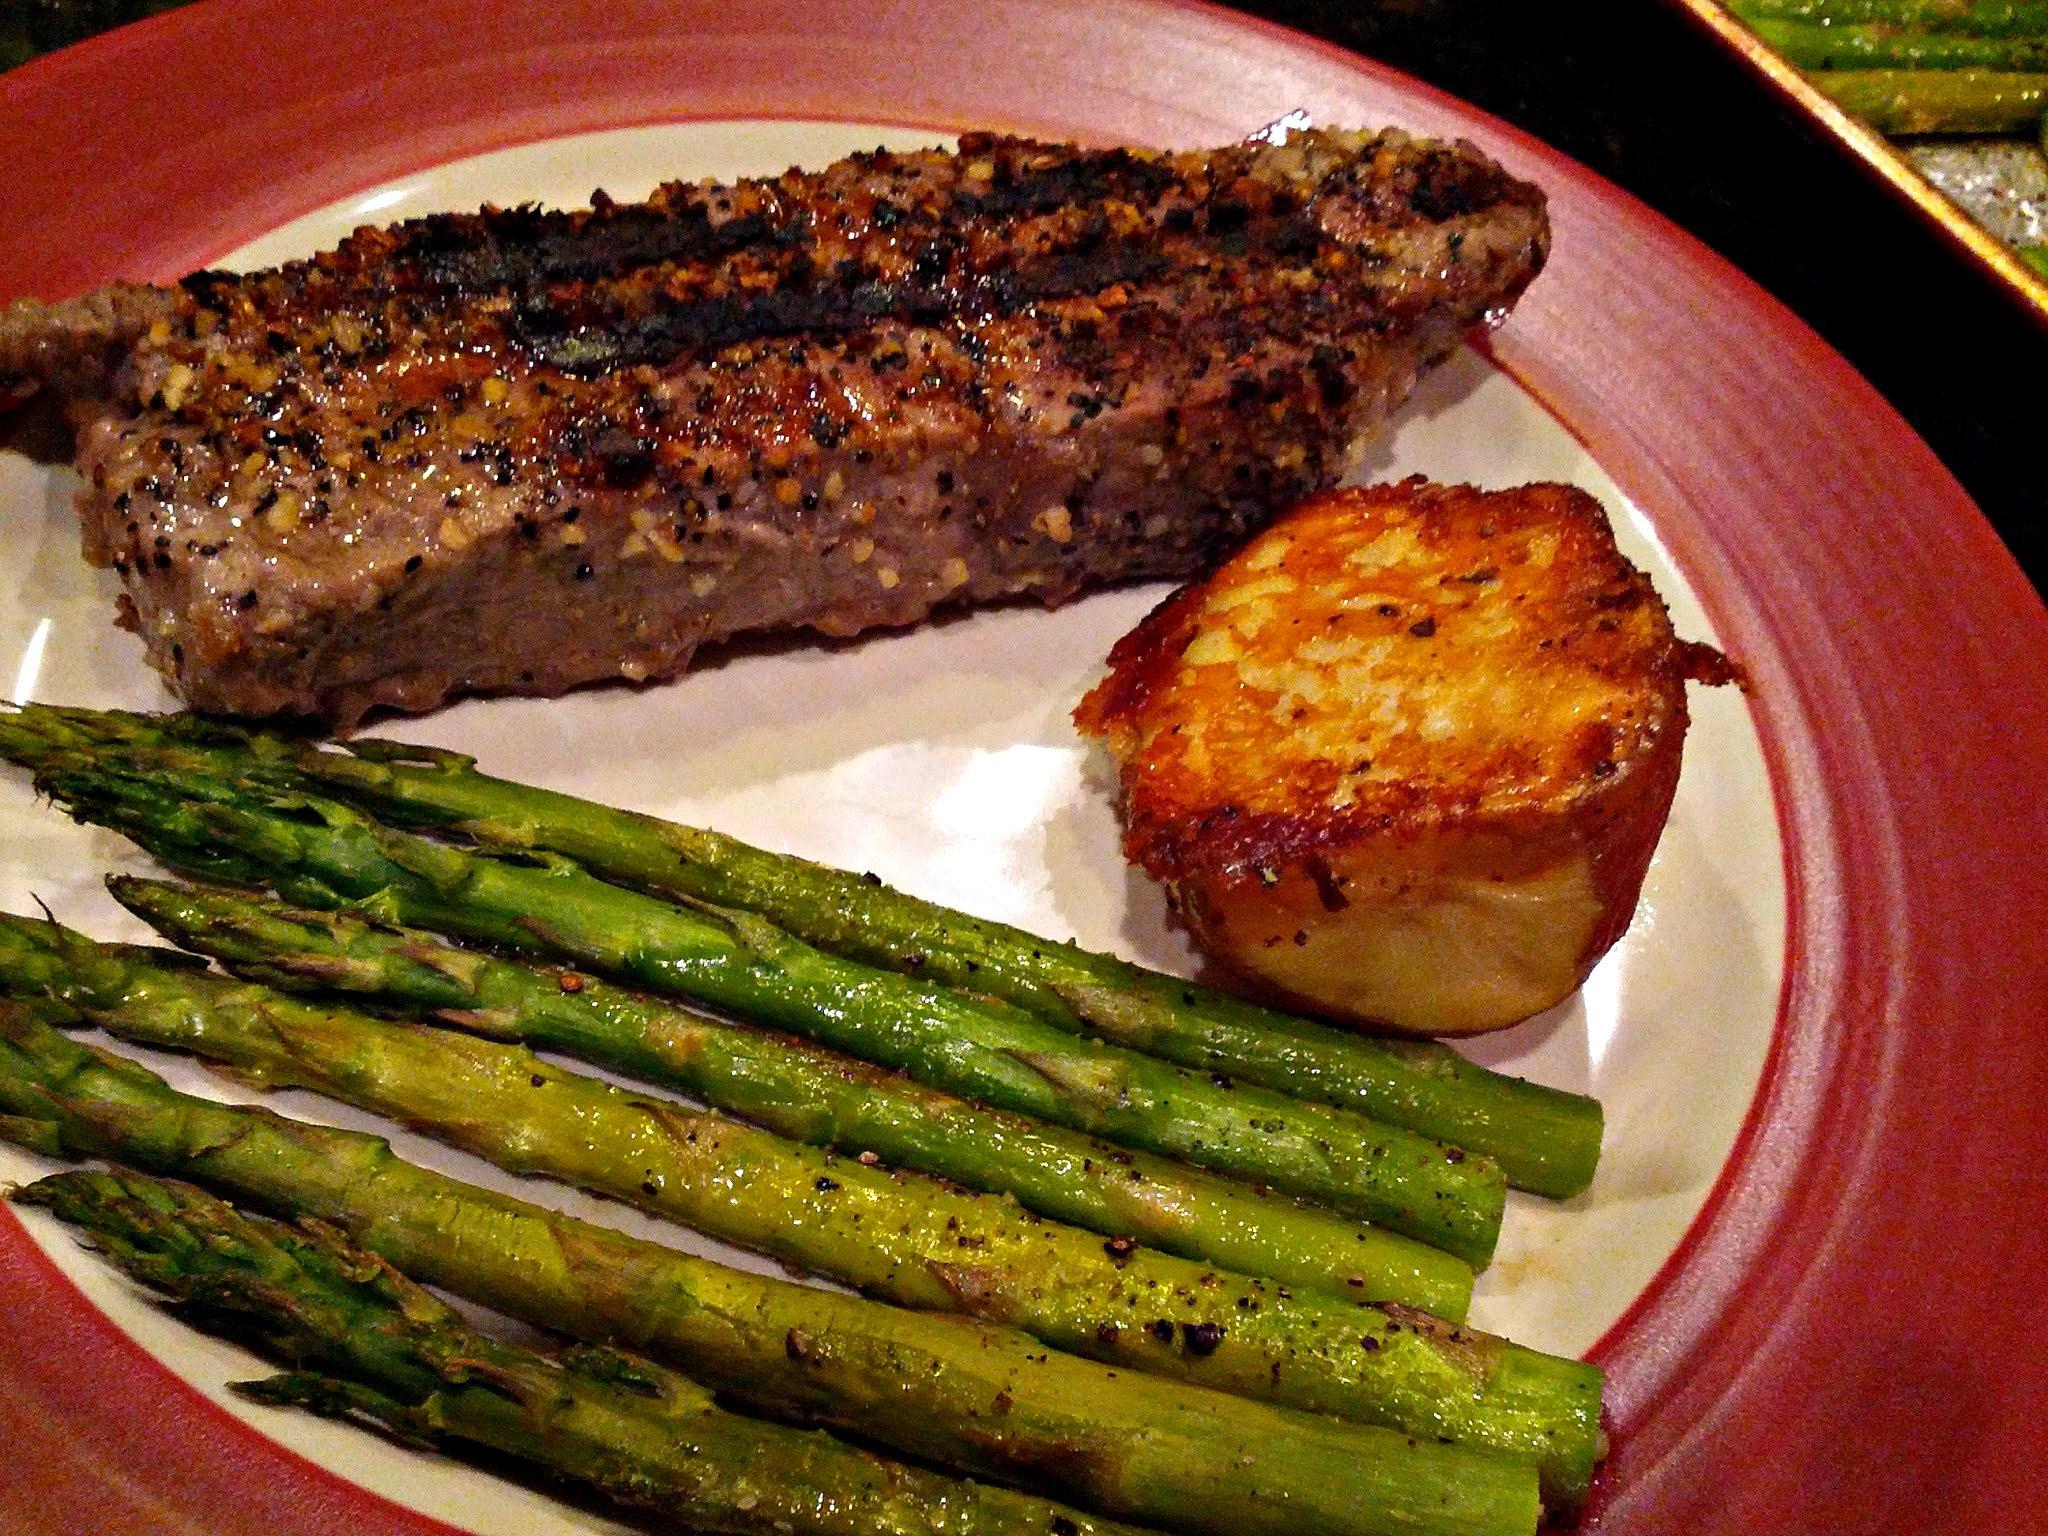 Side Dishes For Steak Dinner  Parmesan Upside Down Baked Potatoes